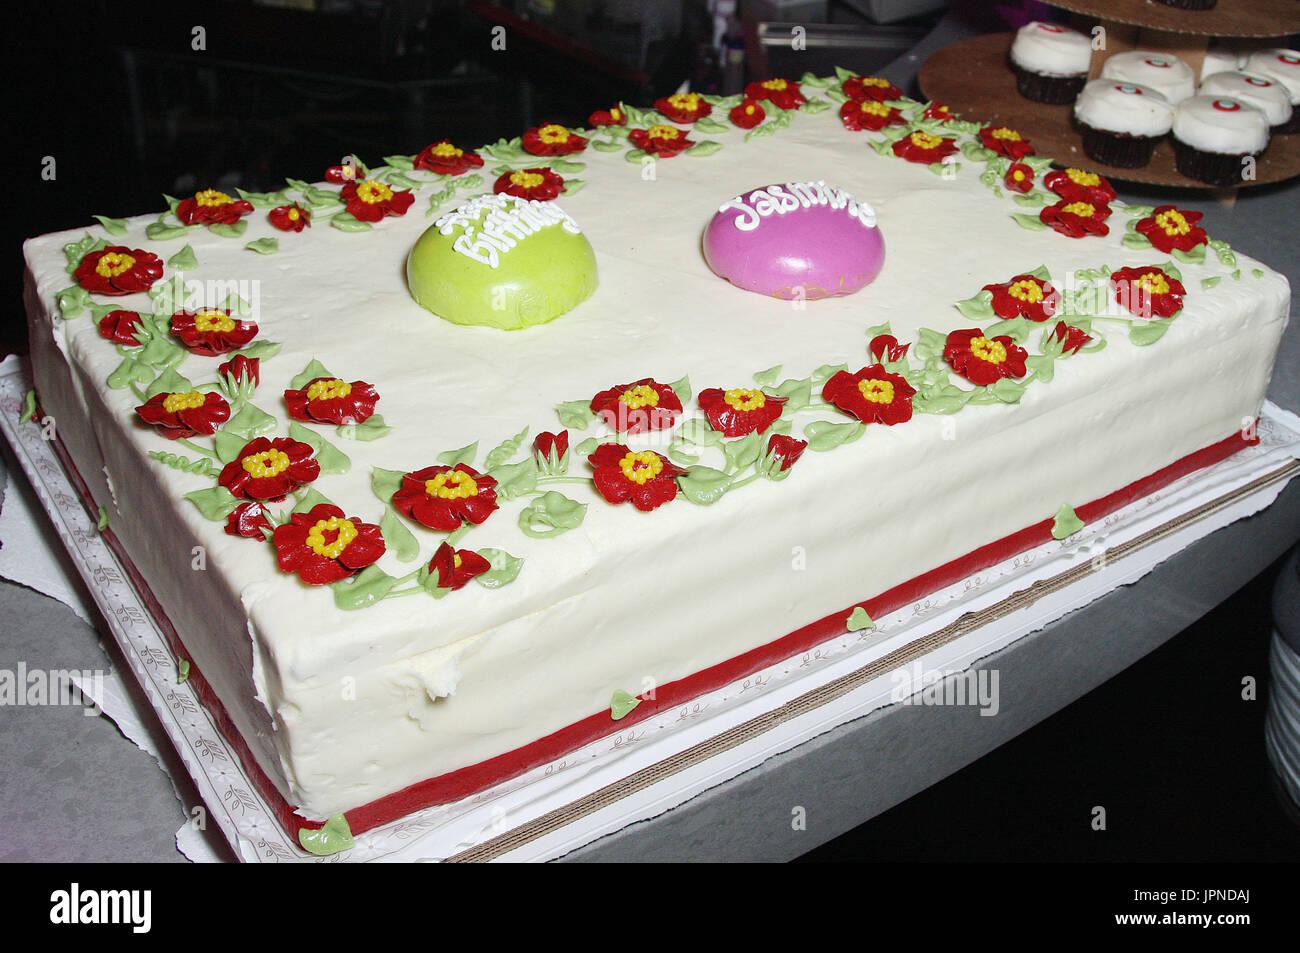 Incredible Jasmine Villegas Birthday Cake At The 18Th Birthday Party Of Funny Birthday Cards Online Elaedamsfinfo